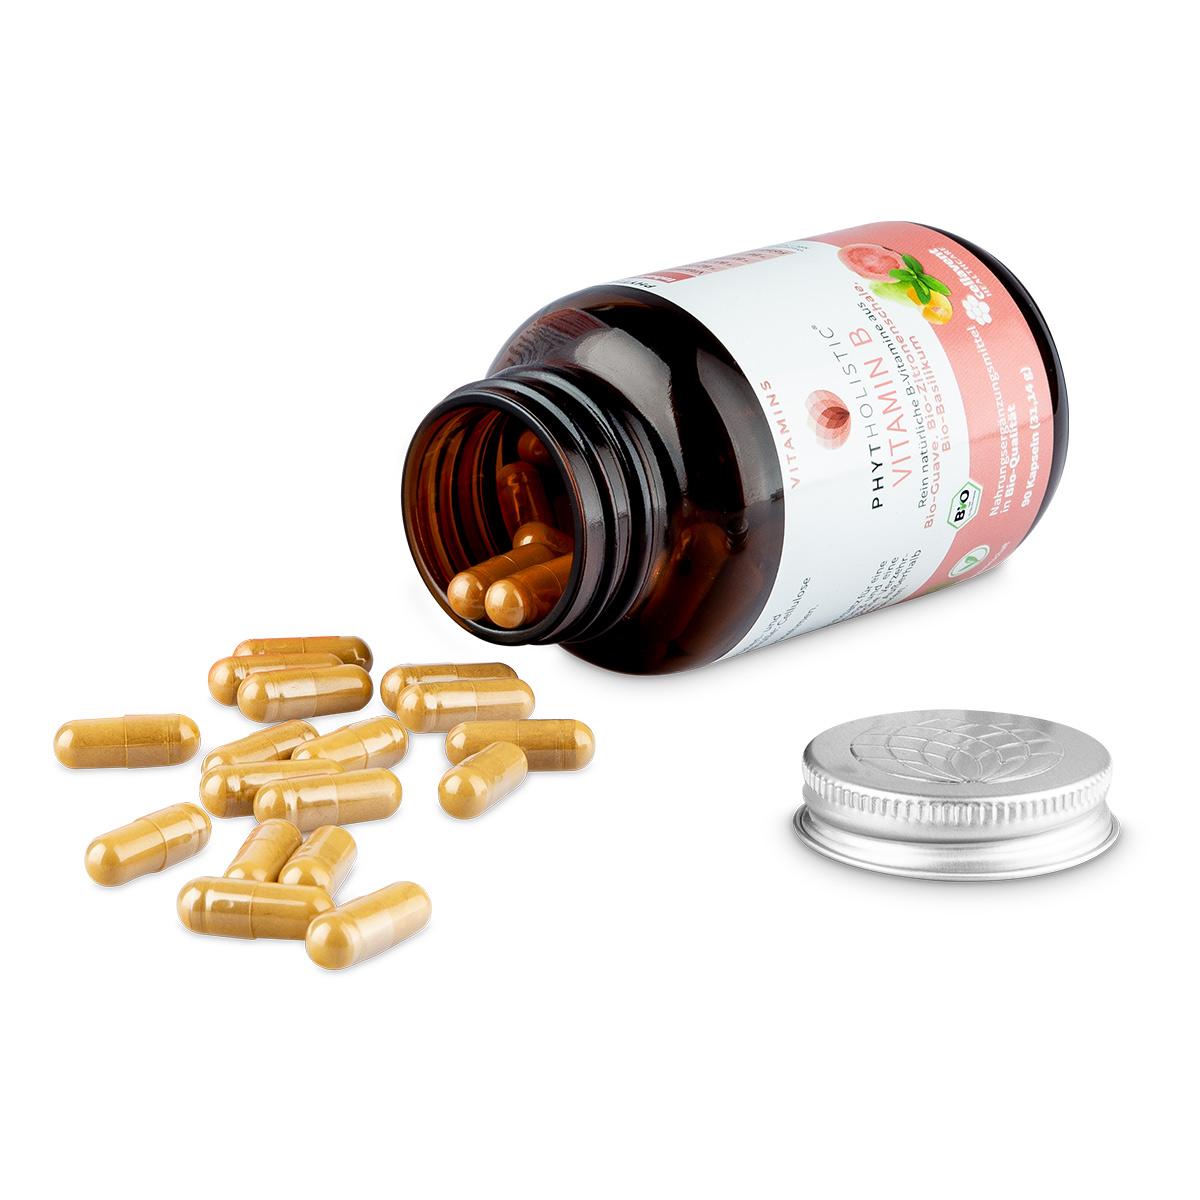 vitamin-b-kapseln-bio-rein-pflanzlich-phytholistic-90-stueck-glas-kapseln-1200x1200